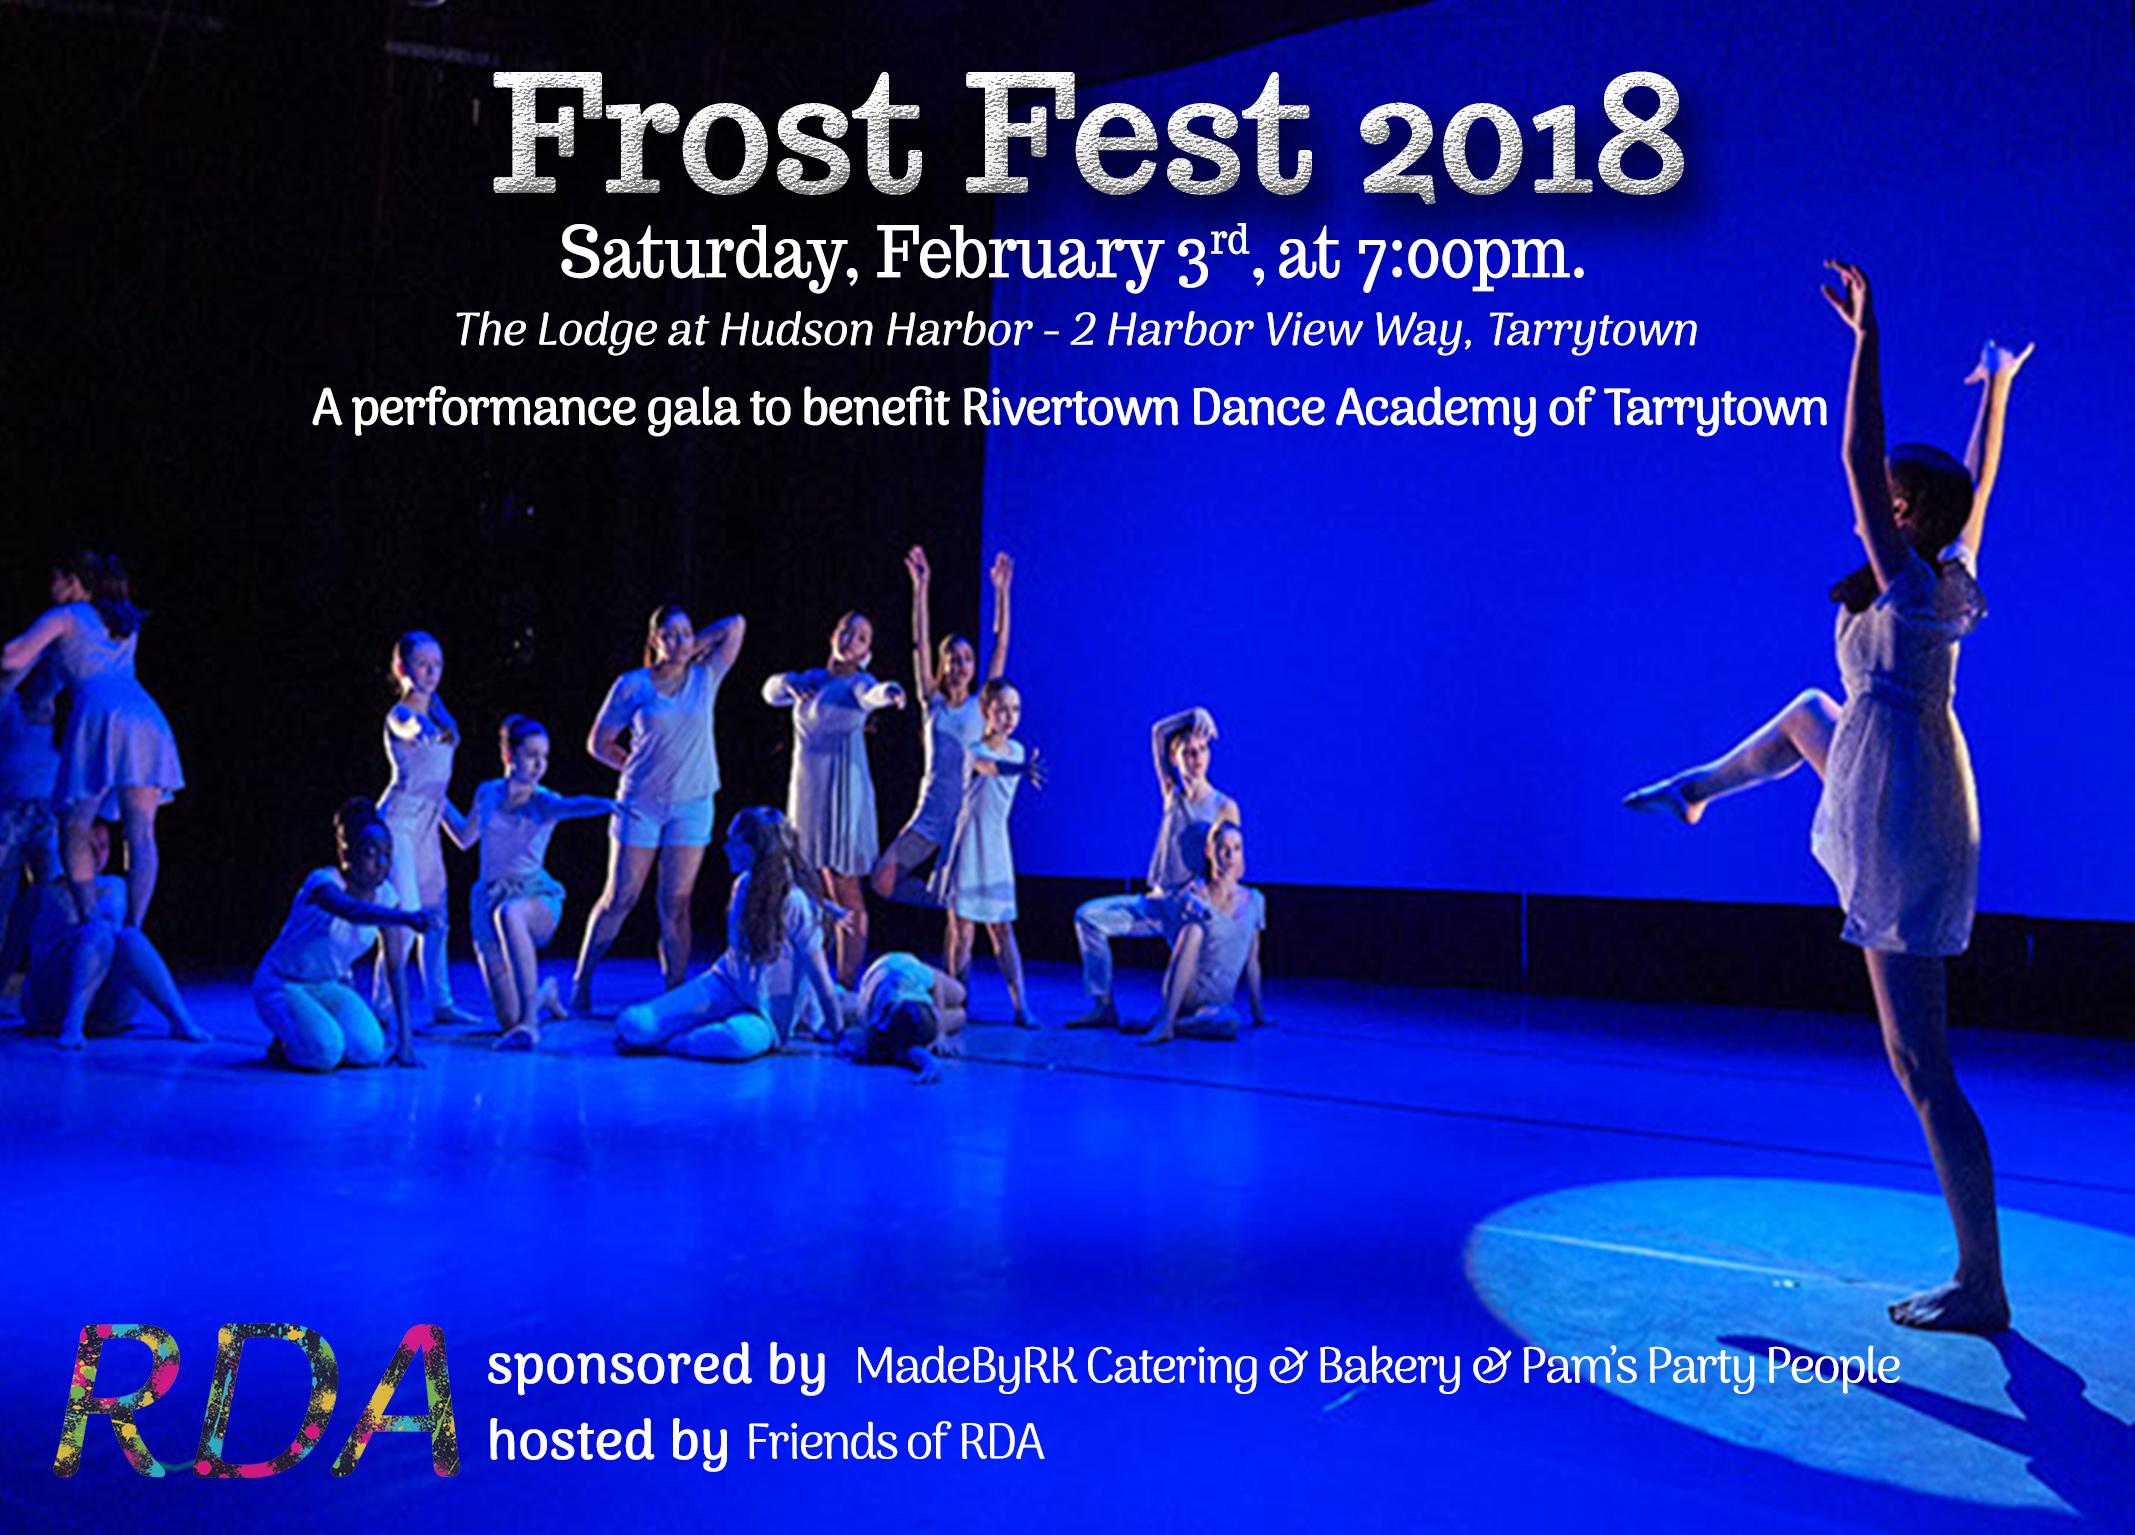 Frost Fest 2018